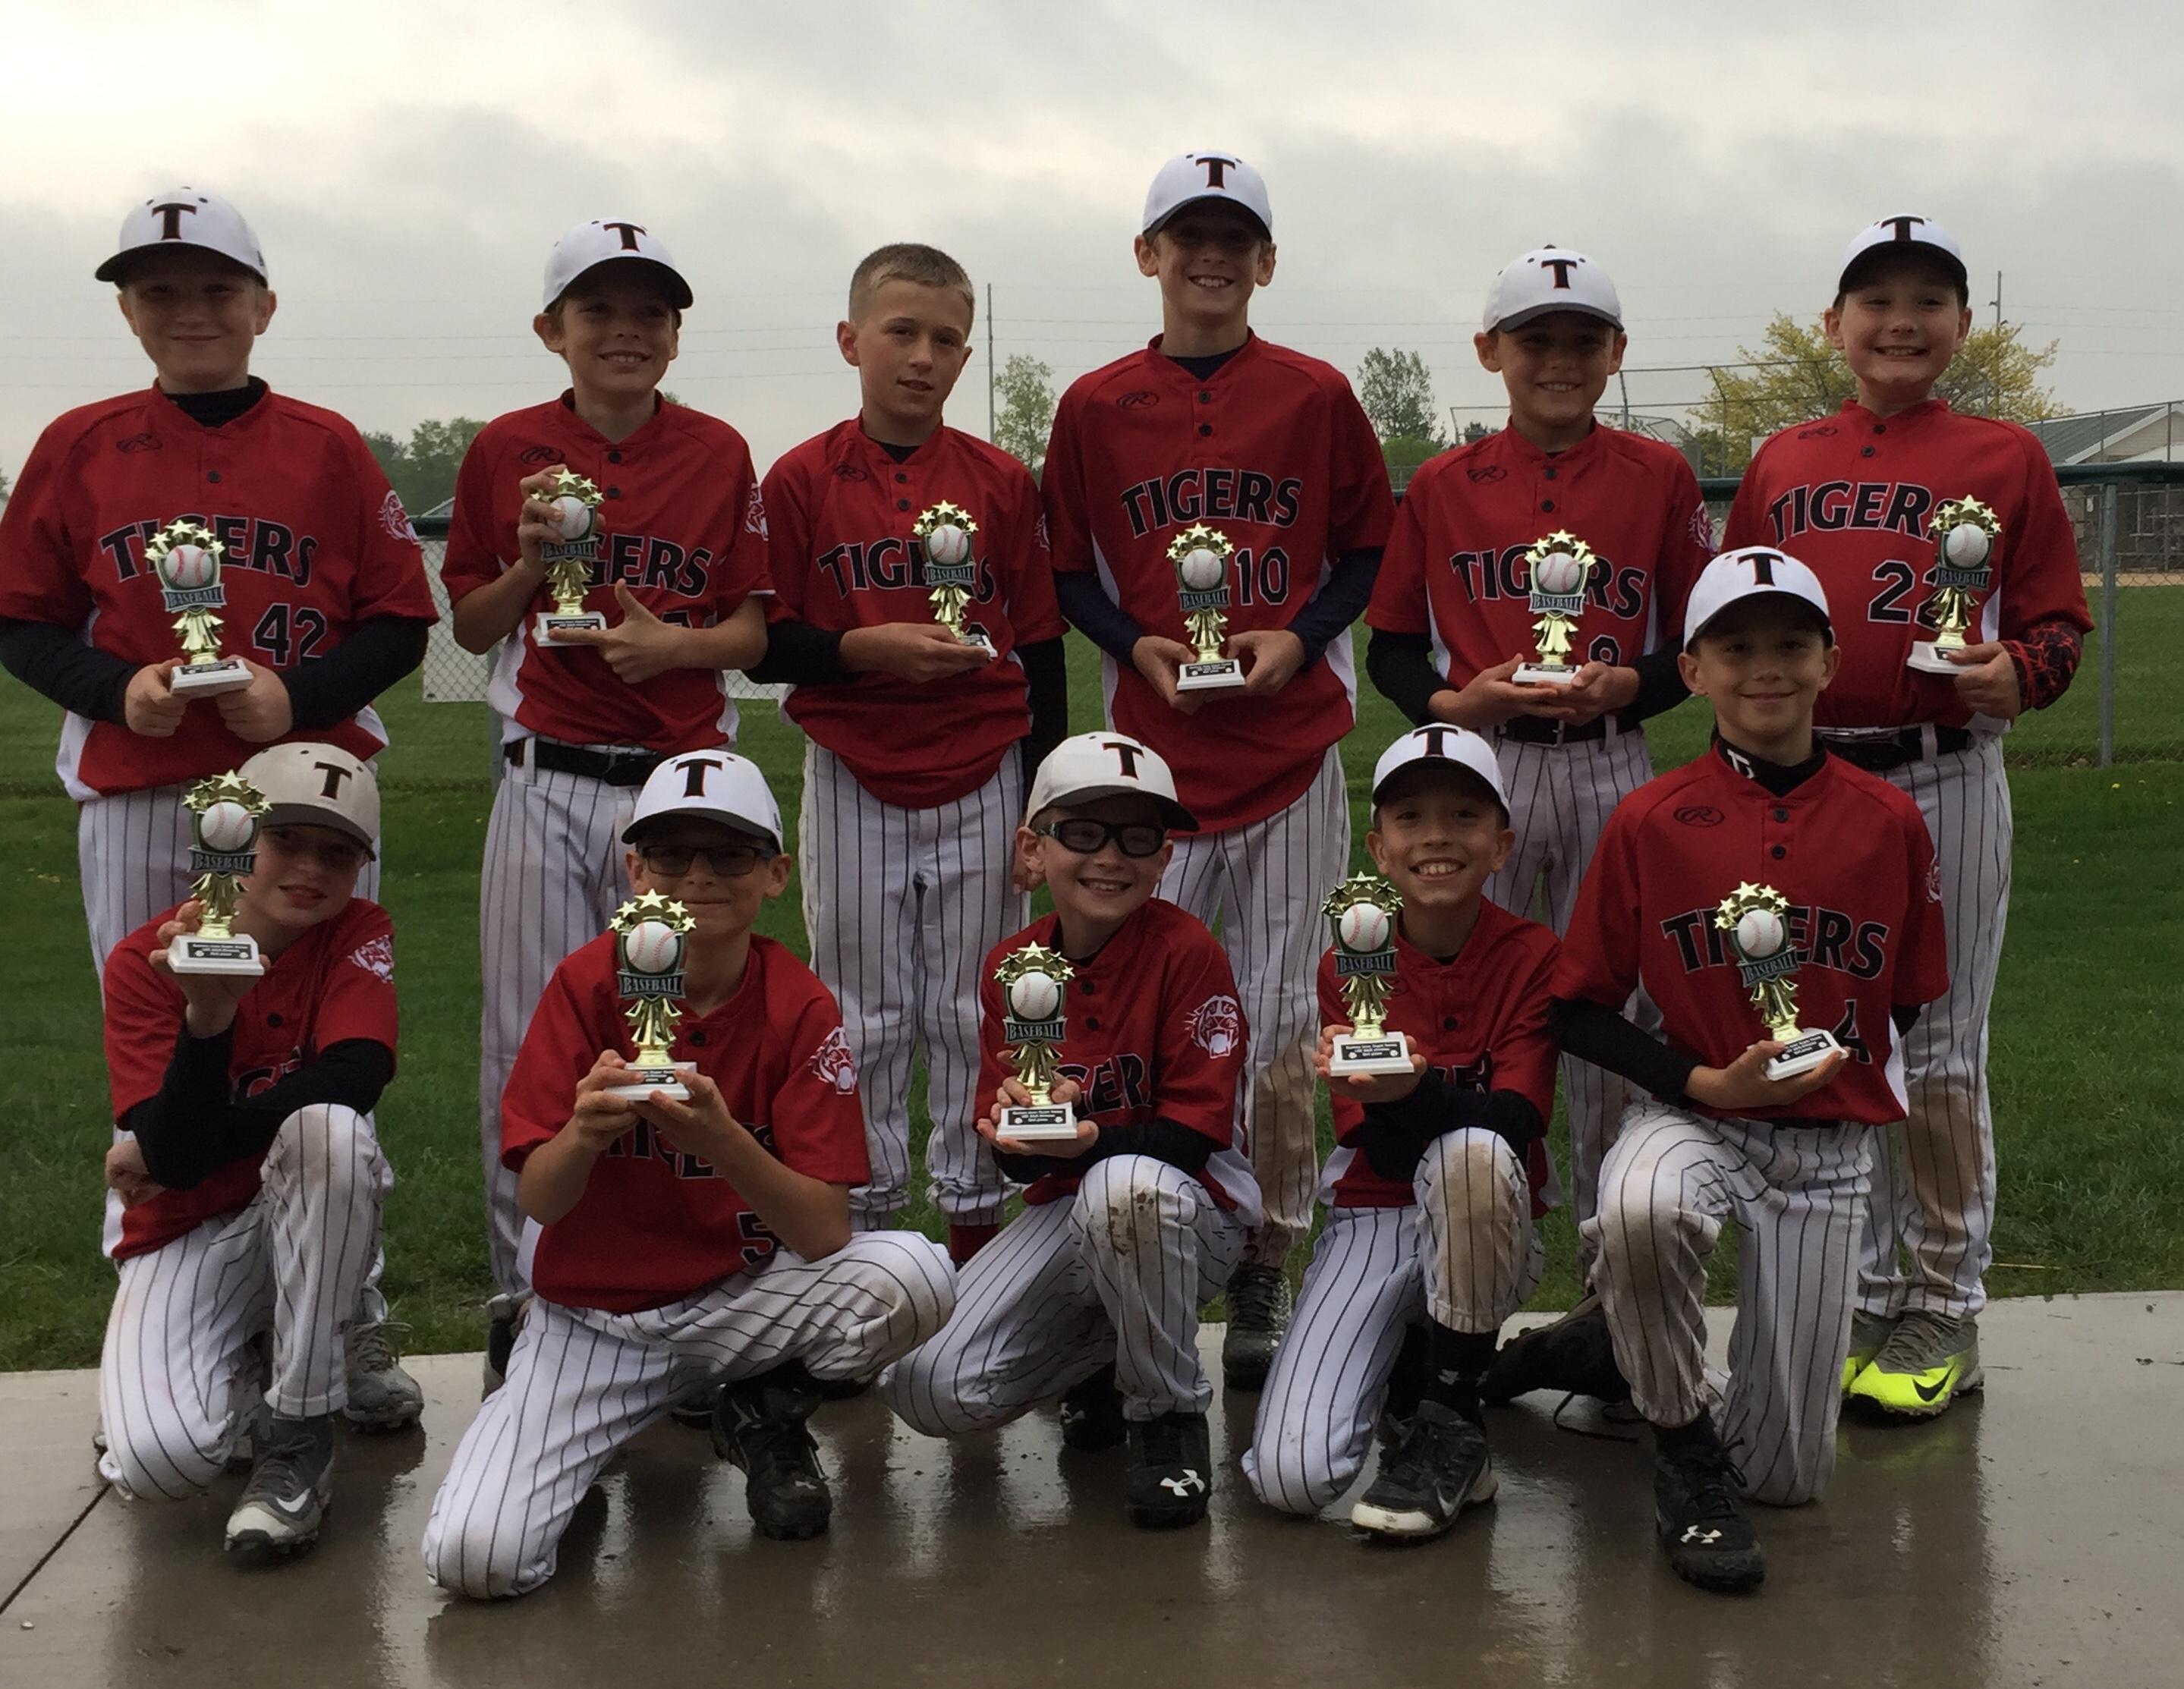 USSSA | USA Elite Select Team: Tigers Baseball Club 10U Red